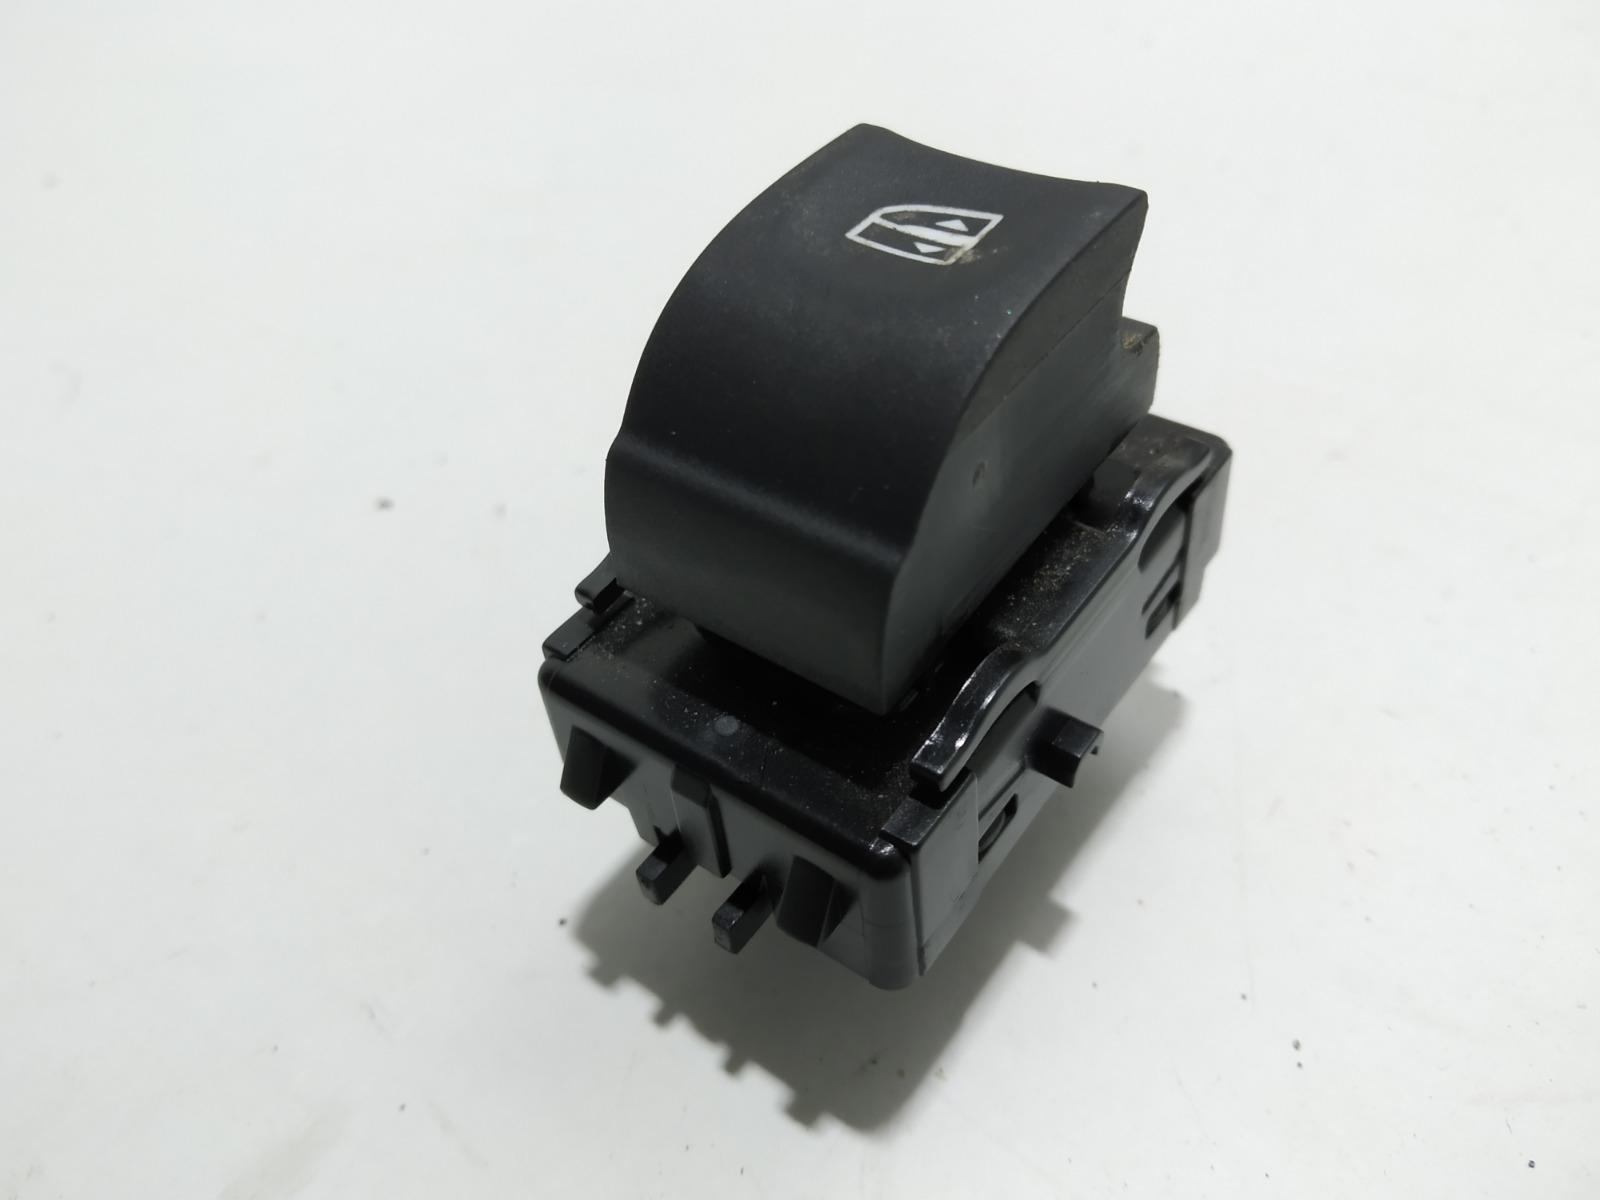 Кнопка стеклоподъемника Renault Megane 1.5 DCI 2009 (б/у)